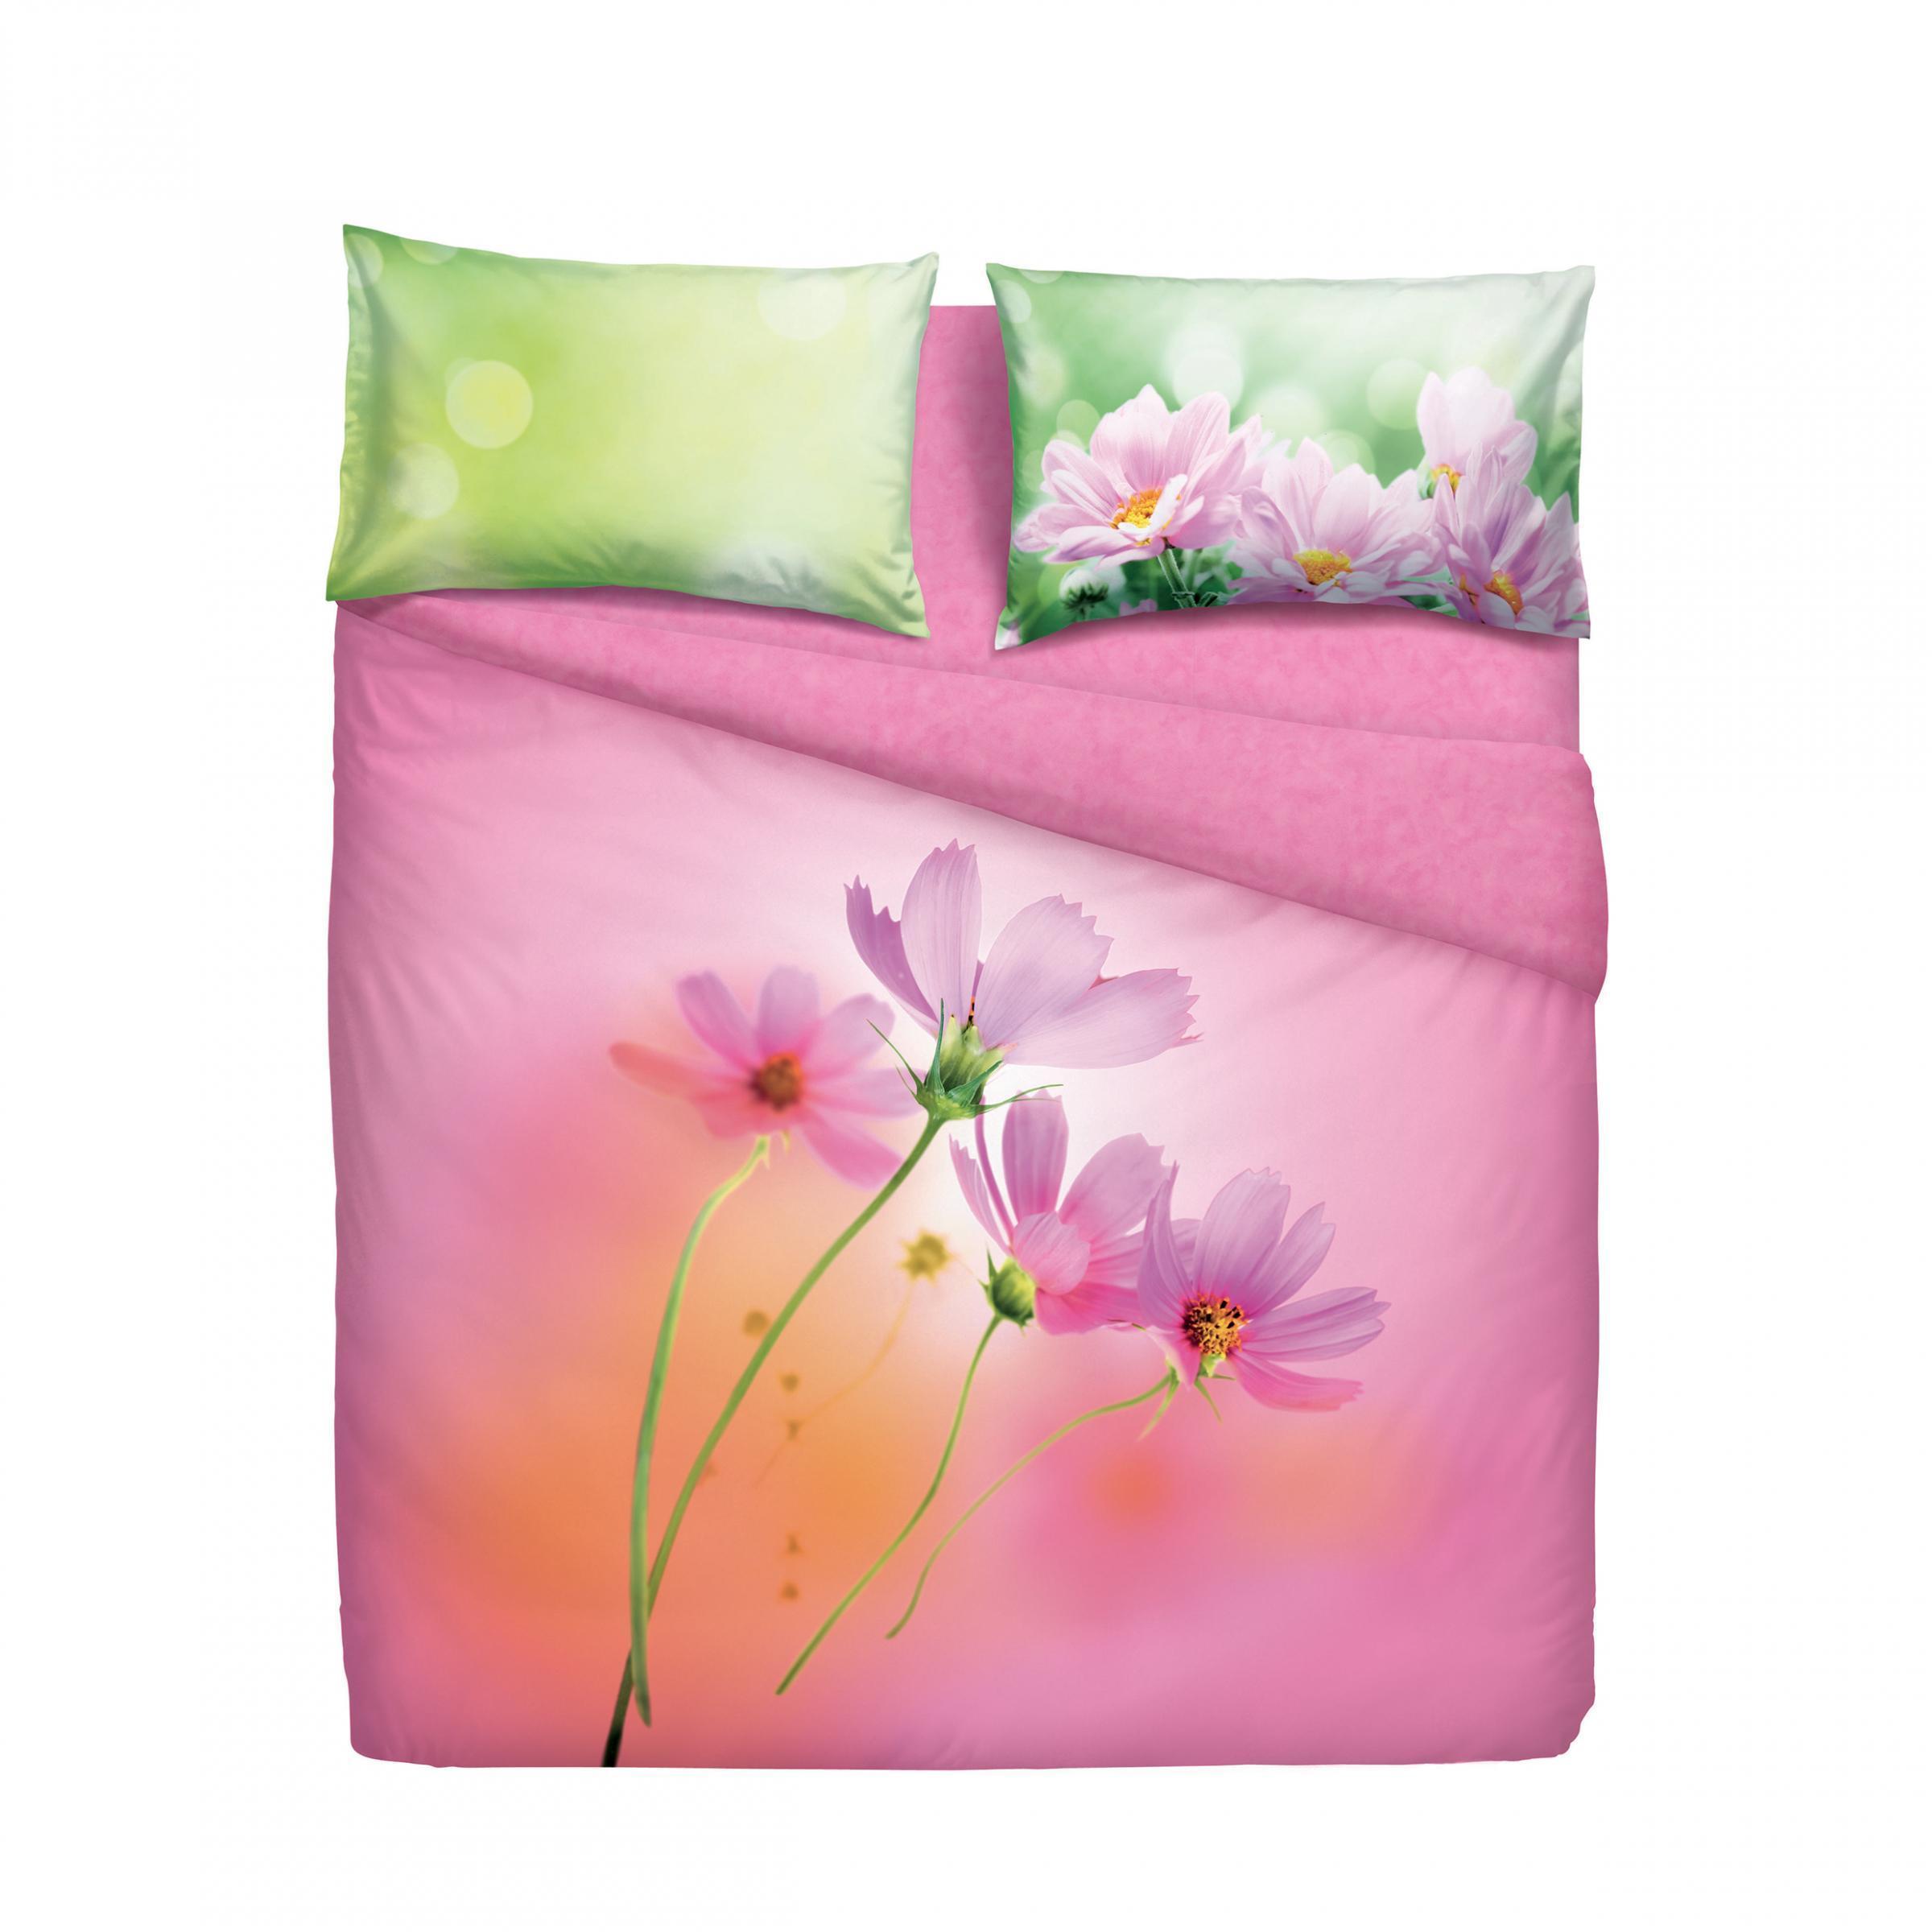 Set copripiumino letto matrimoniale 2 piazze bassetti pink spring rosa - Set letto matrimoniale ...